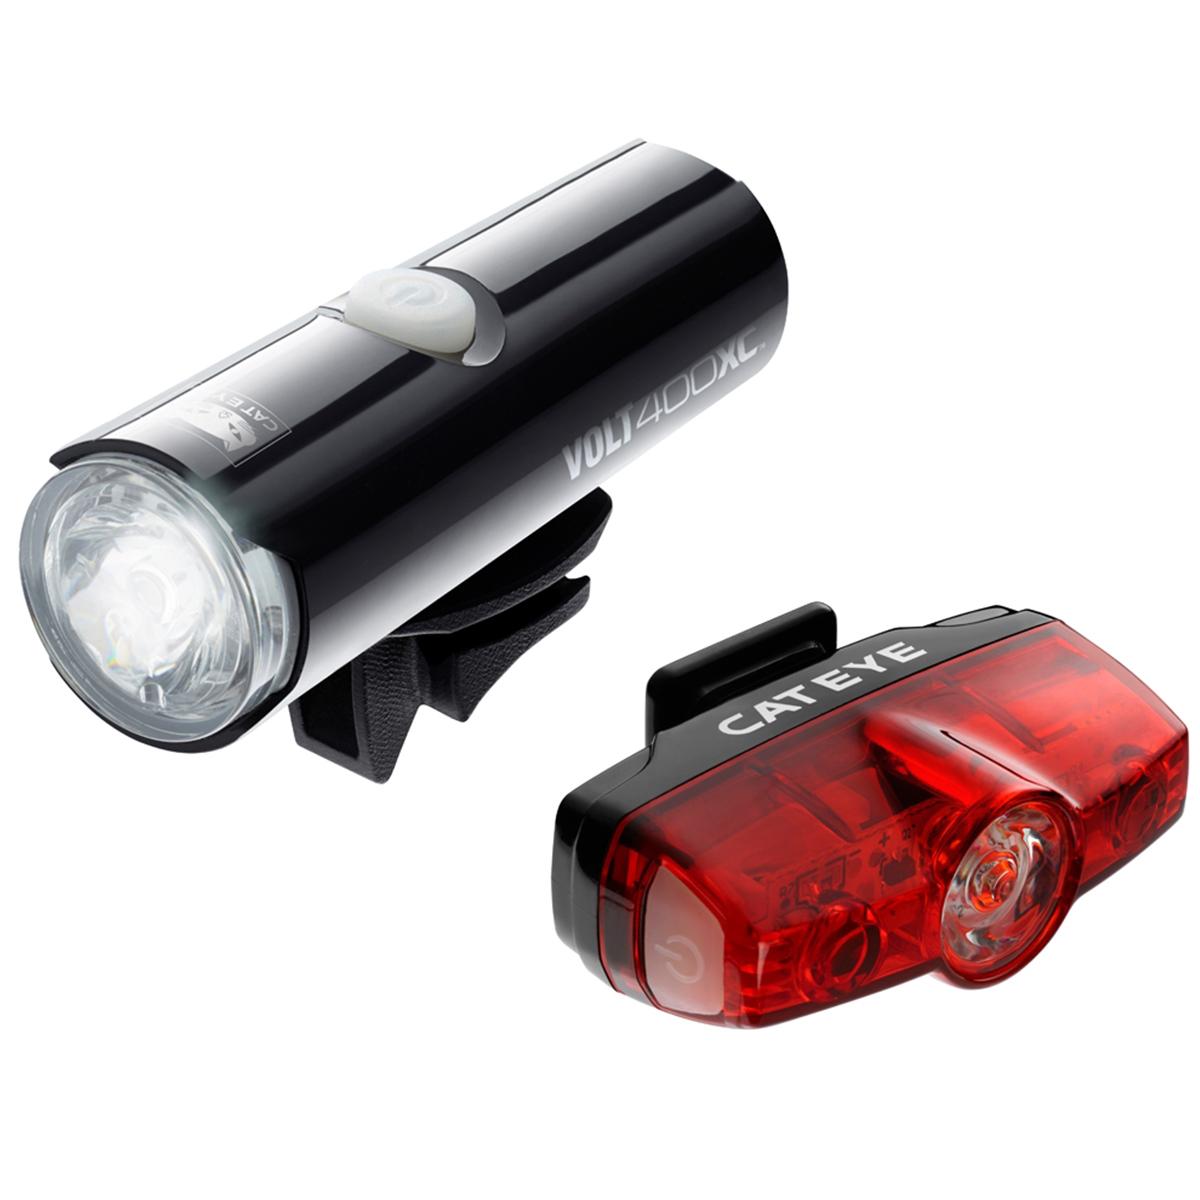 Cateye Volt 400XC & Rapid Mini Rechargeable Light Set